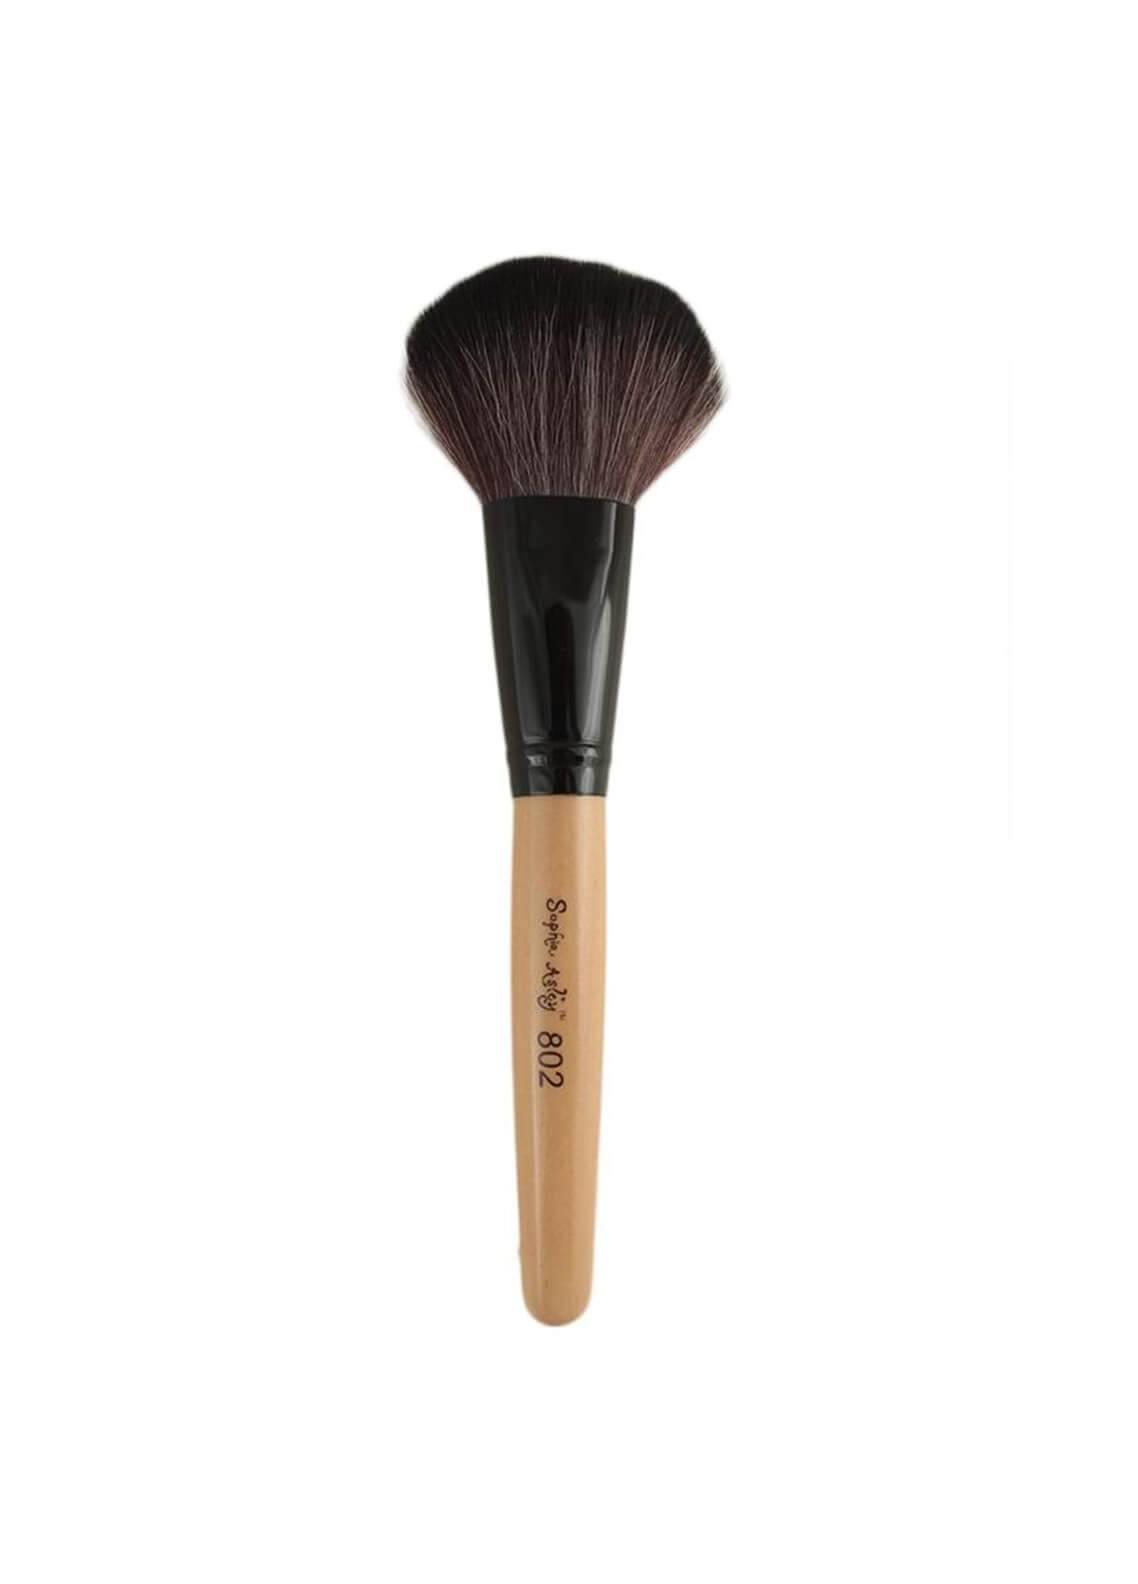 Sophia Asley Professional Blushon Brush (Golden)